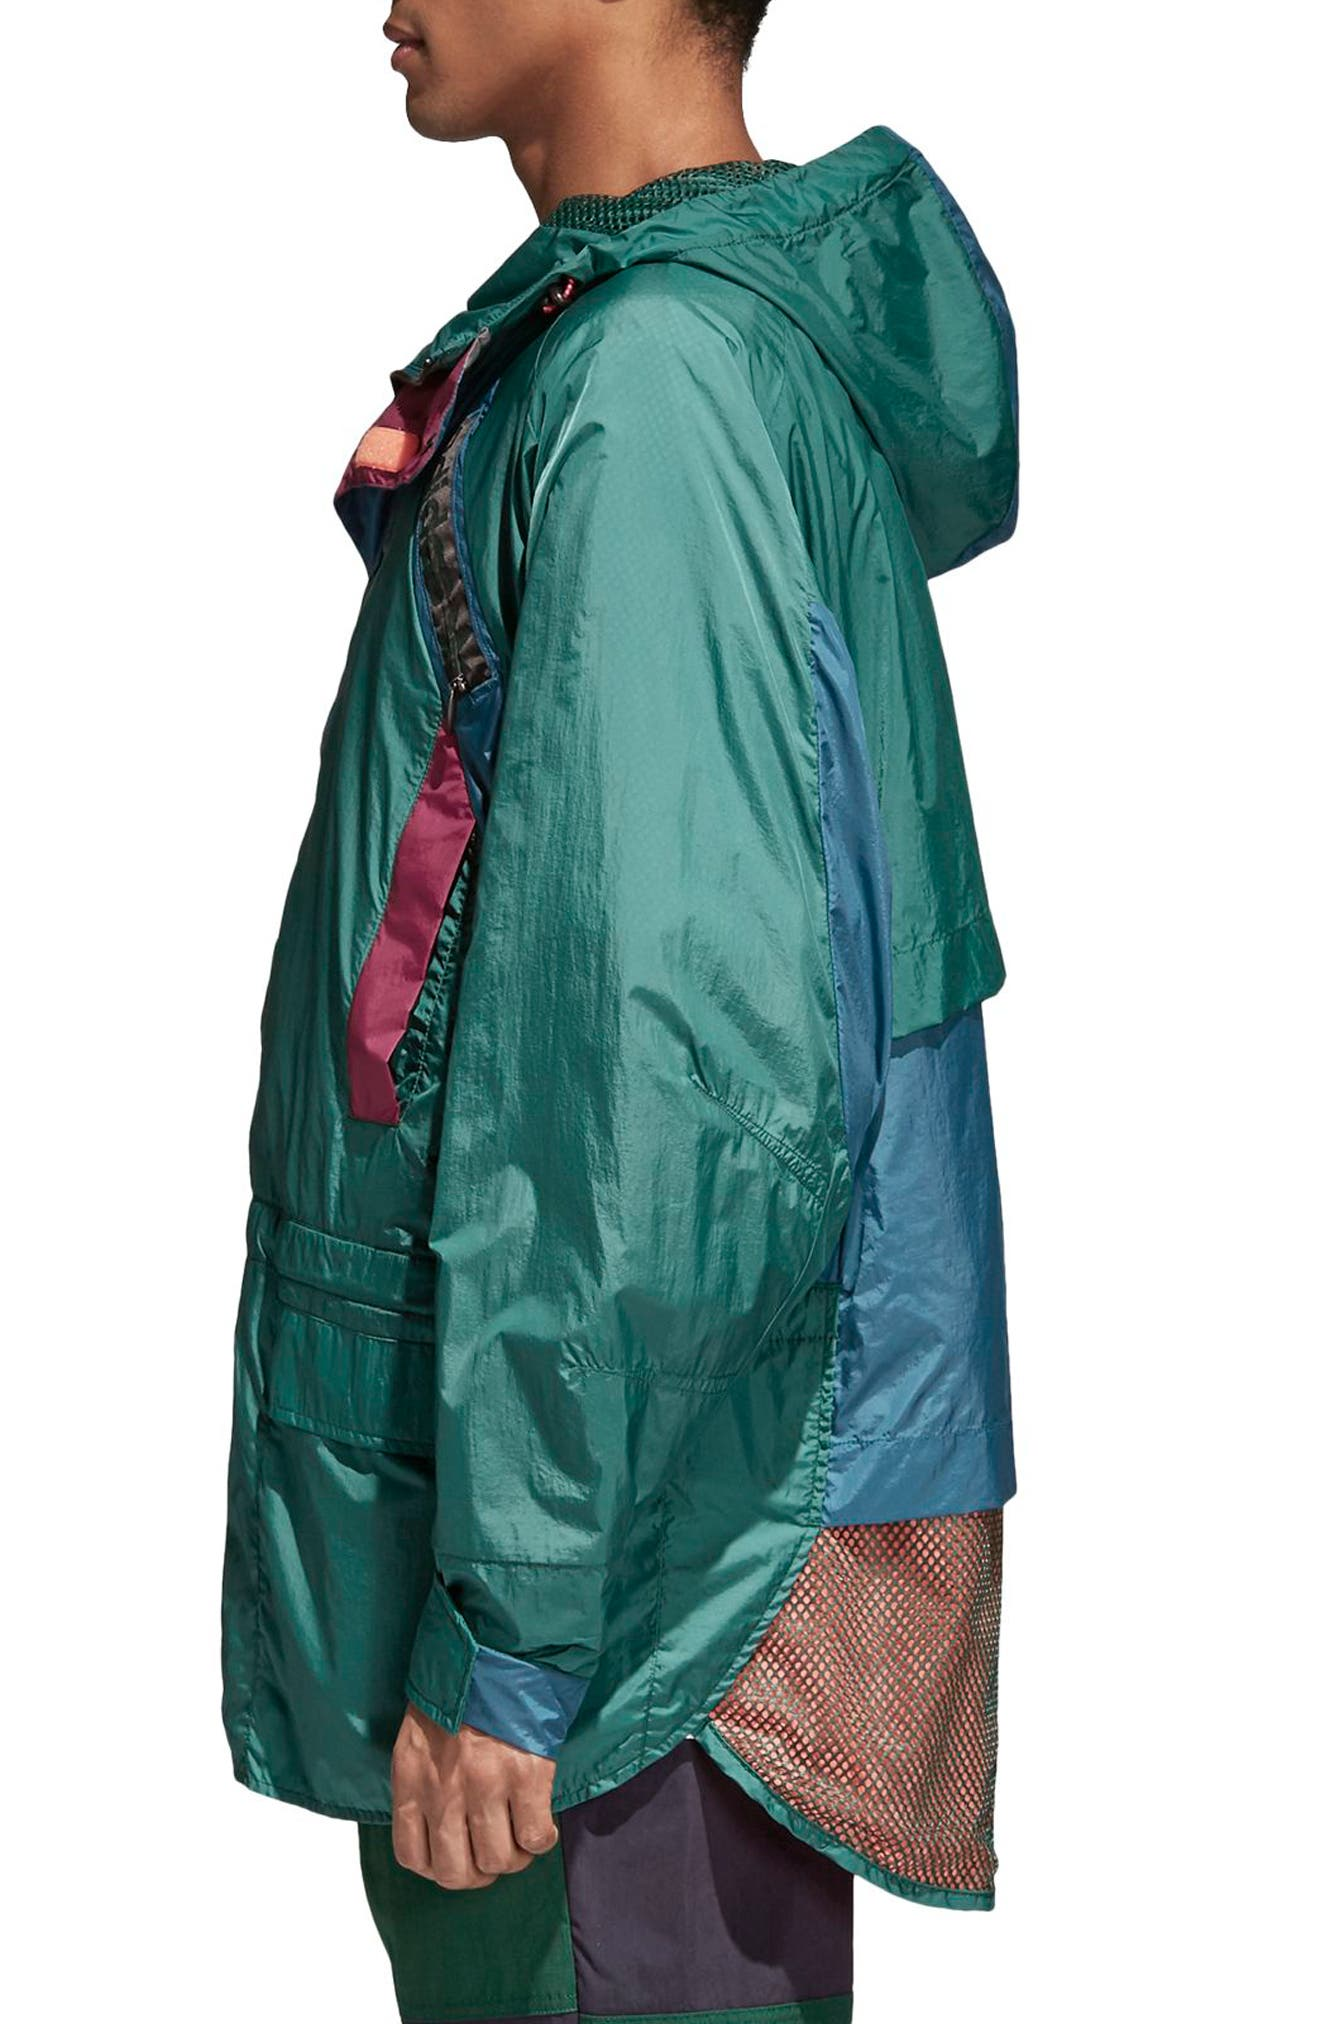 Vintage Jacket,                             Alternate thumbnail 3, color,                             305